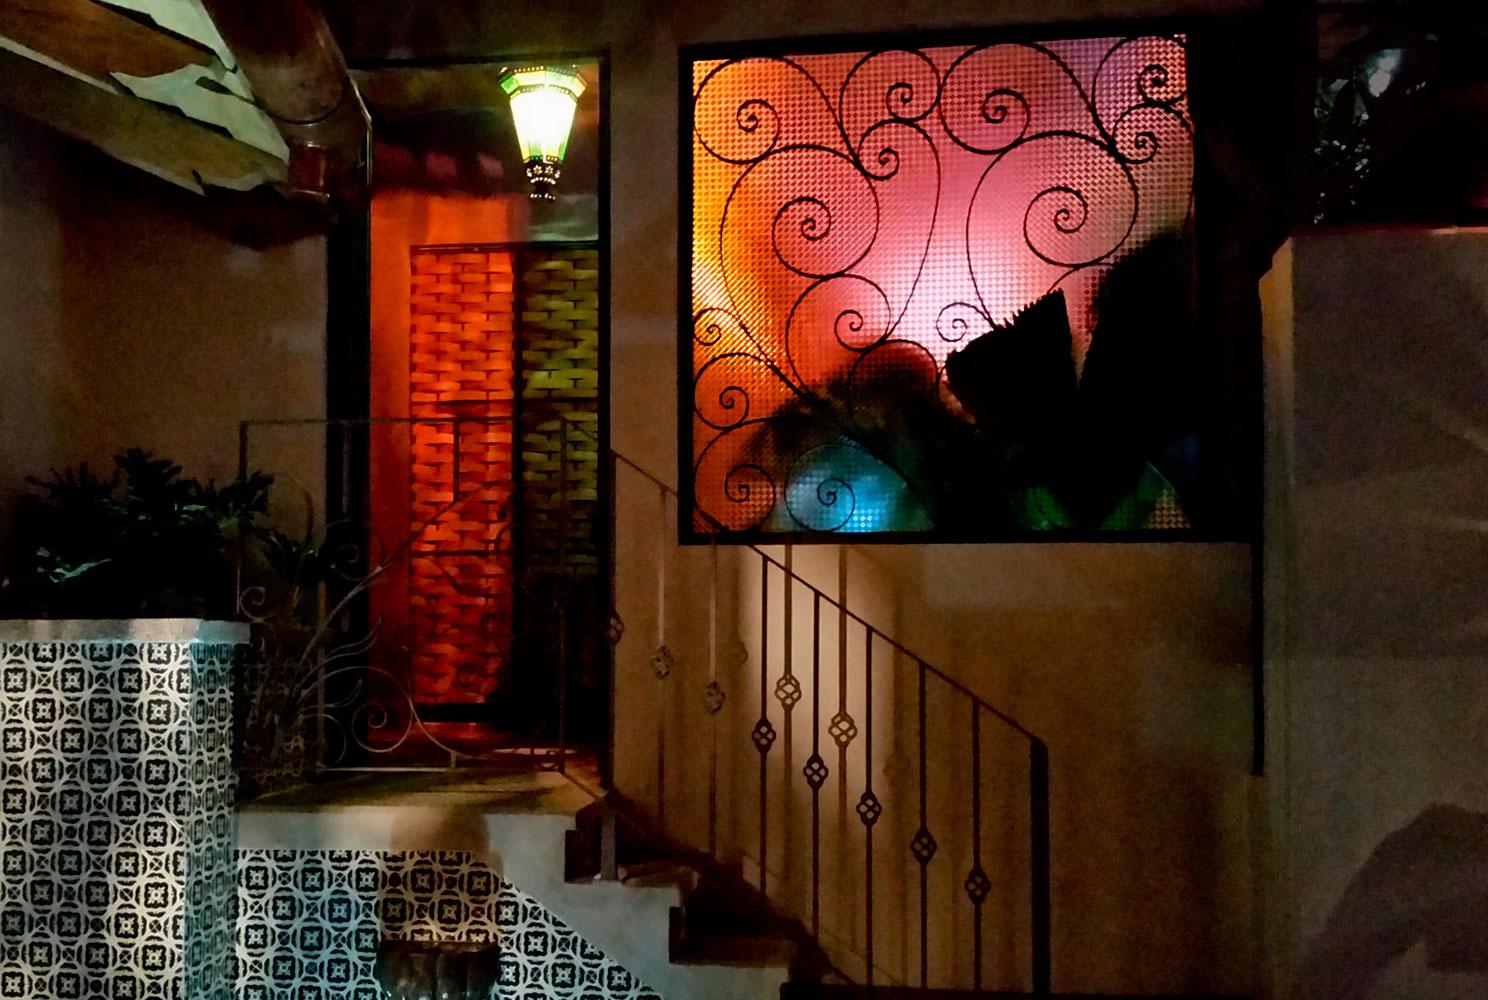 Casa-Joyero-Sayulita-entrance-01.jpg